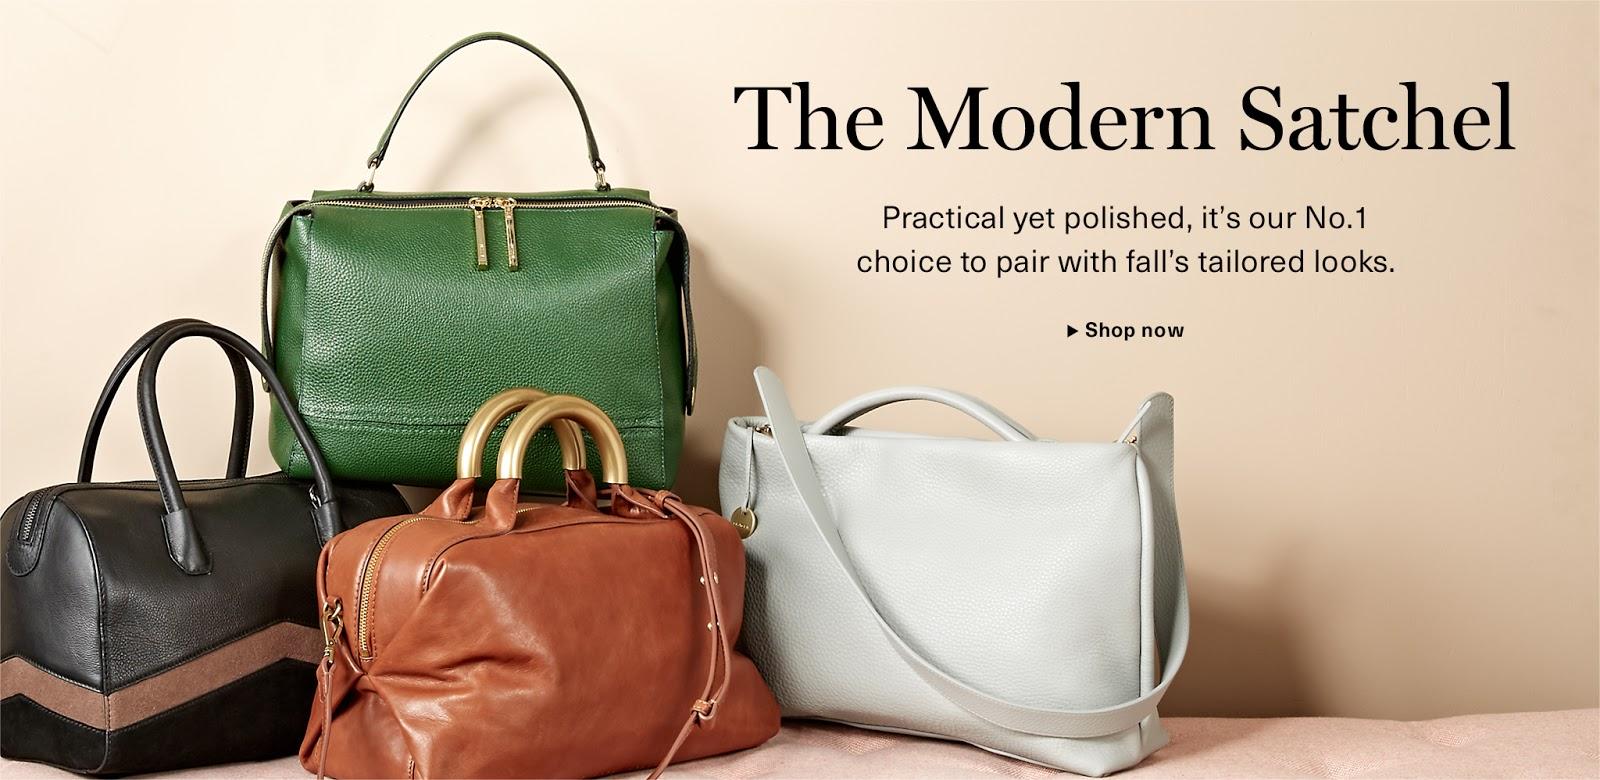 0daa517df افضل حقائب يد نسائية مع الاسعار و بالصور - دليلك لاختيار افضل عطر